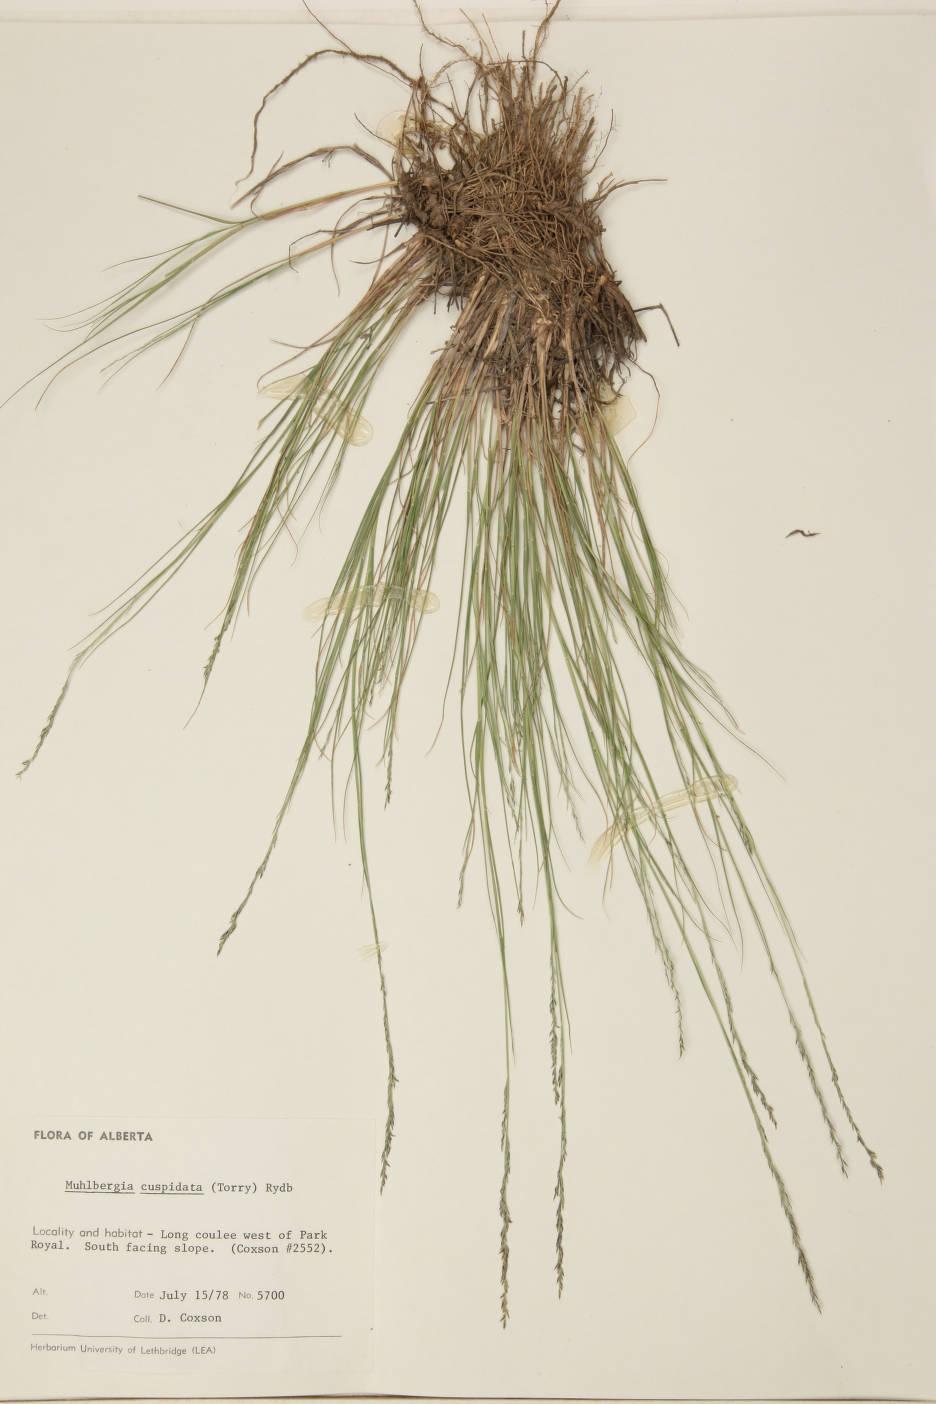 Muhlenbergia cuspidata image